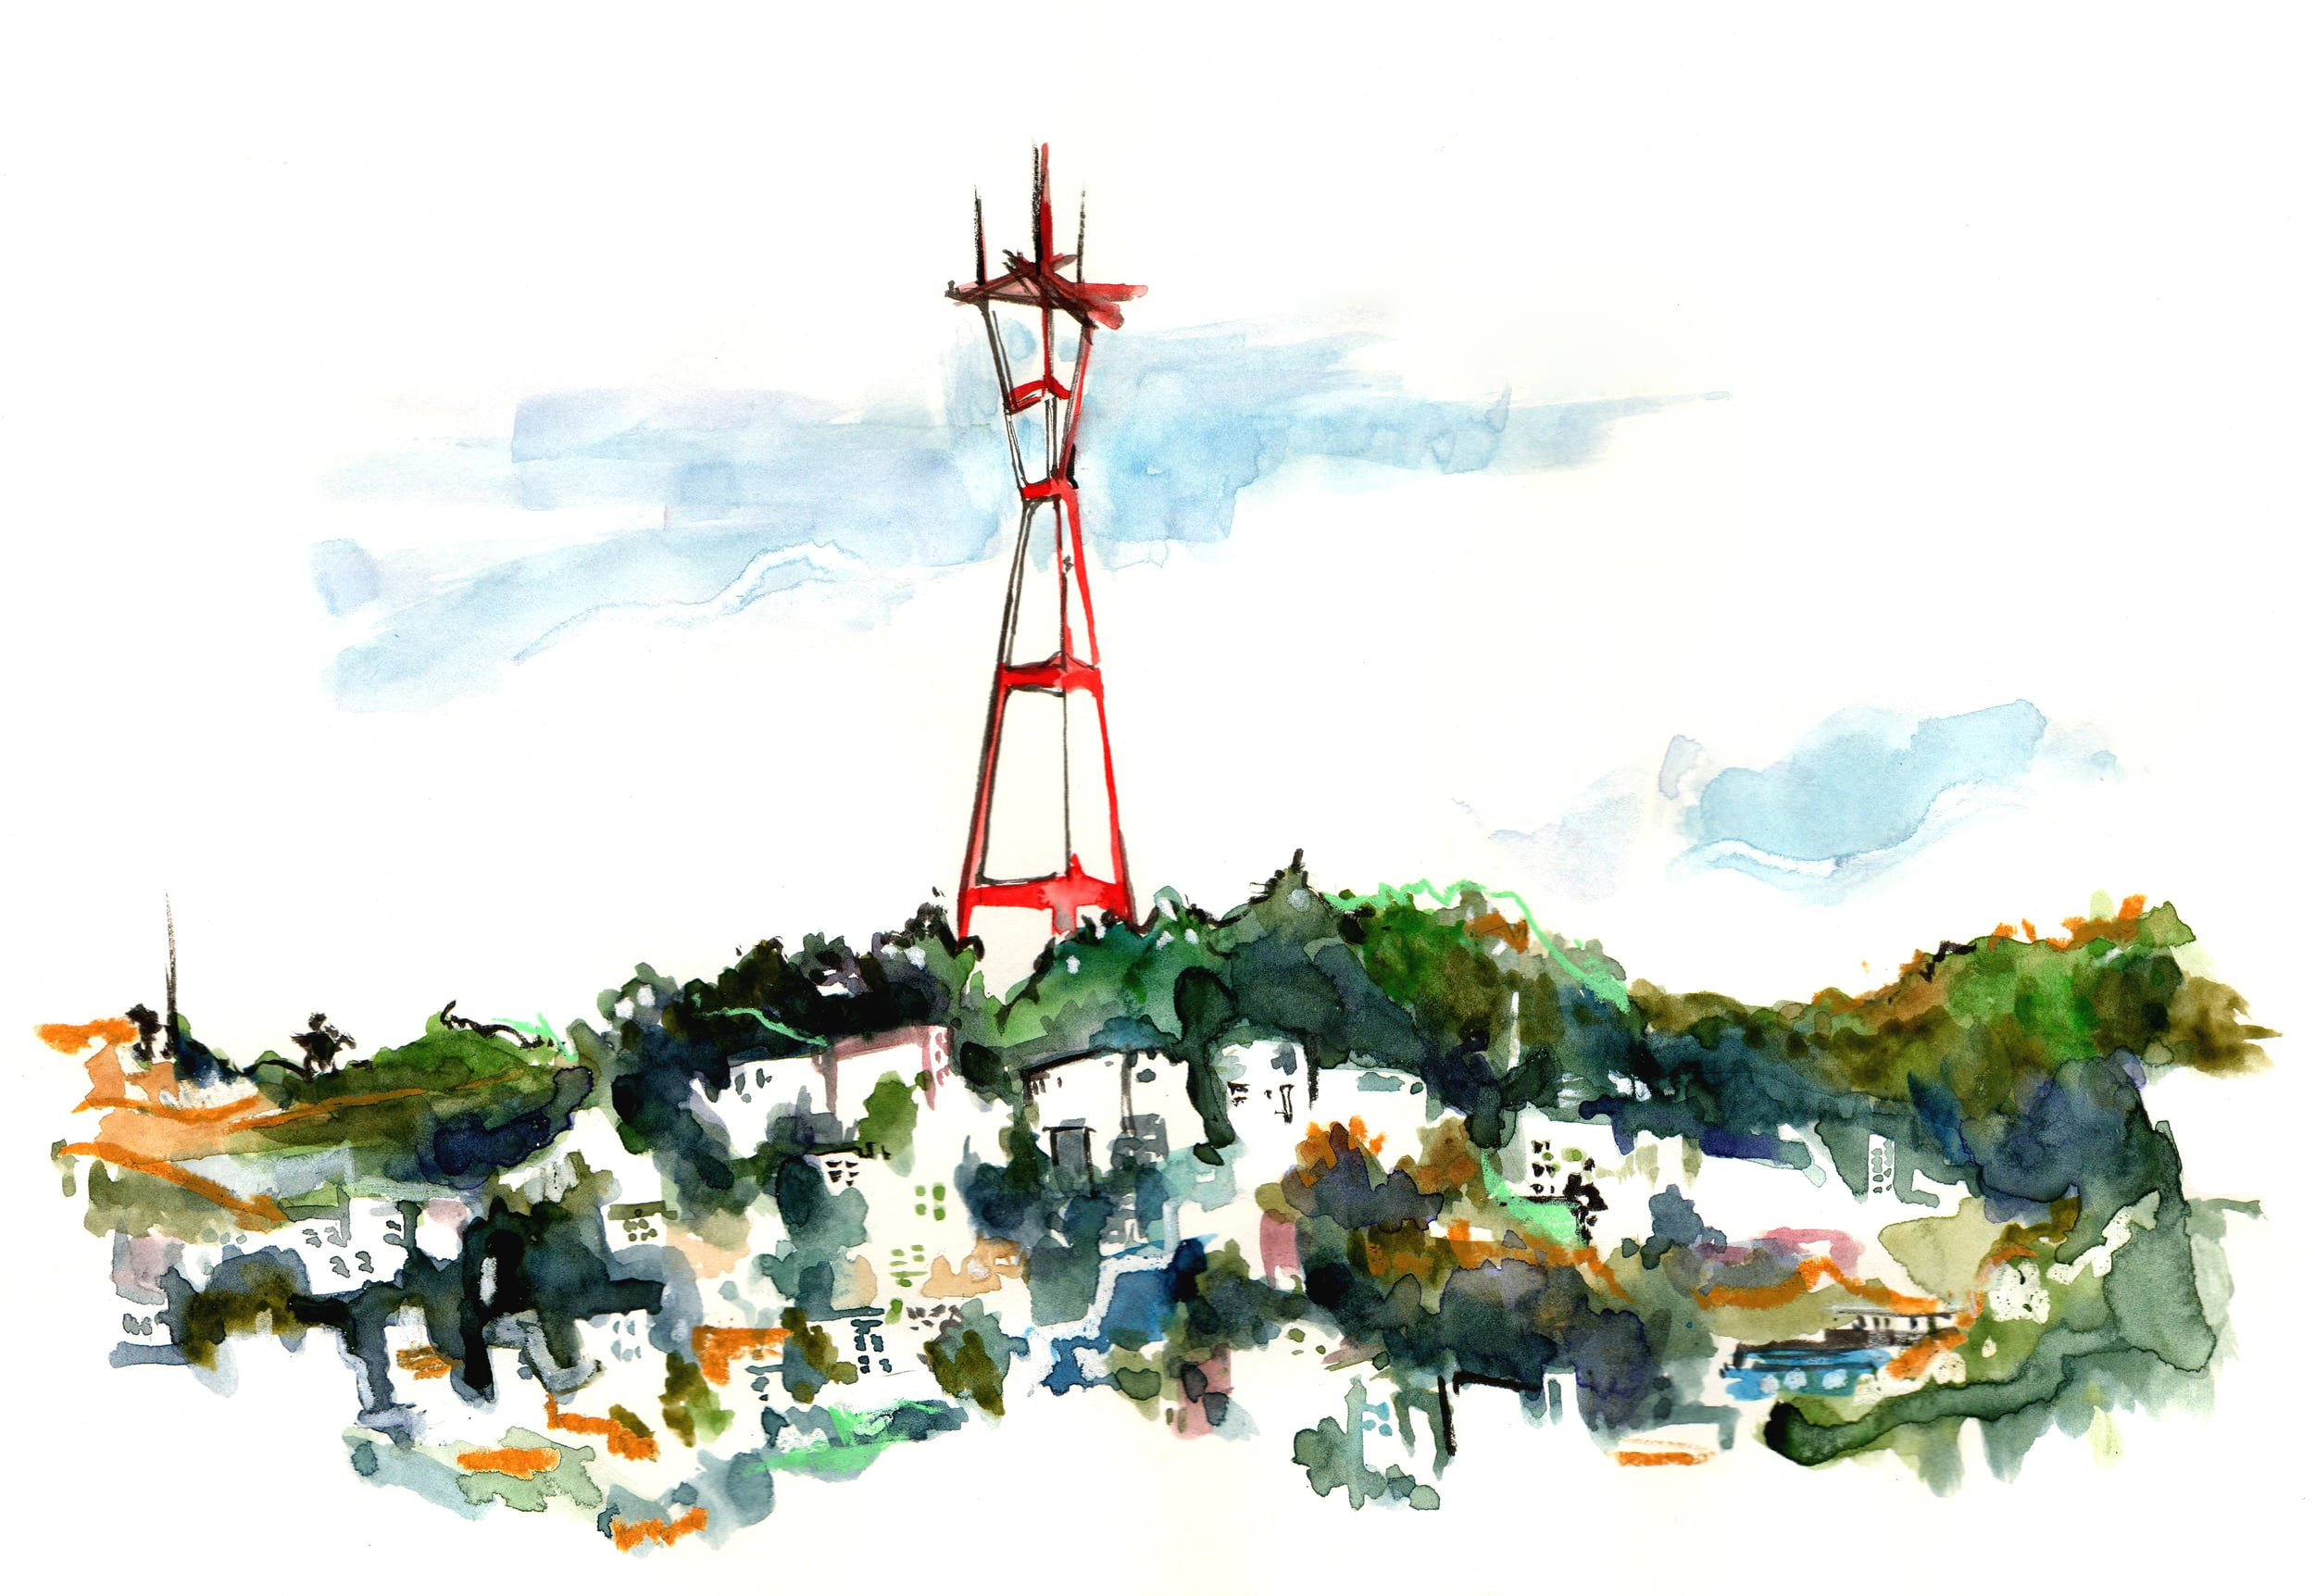 SUTRO TOWER / SAN FRANCISCO, CA